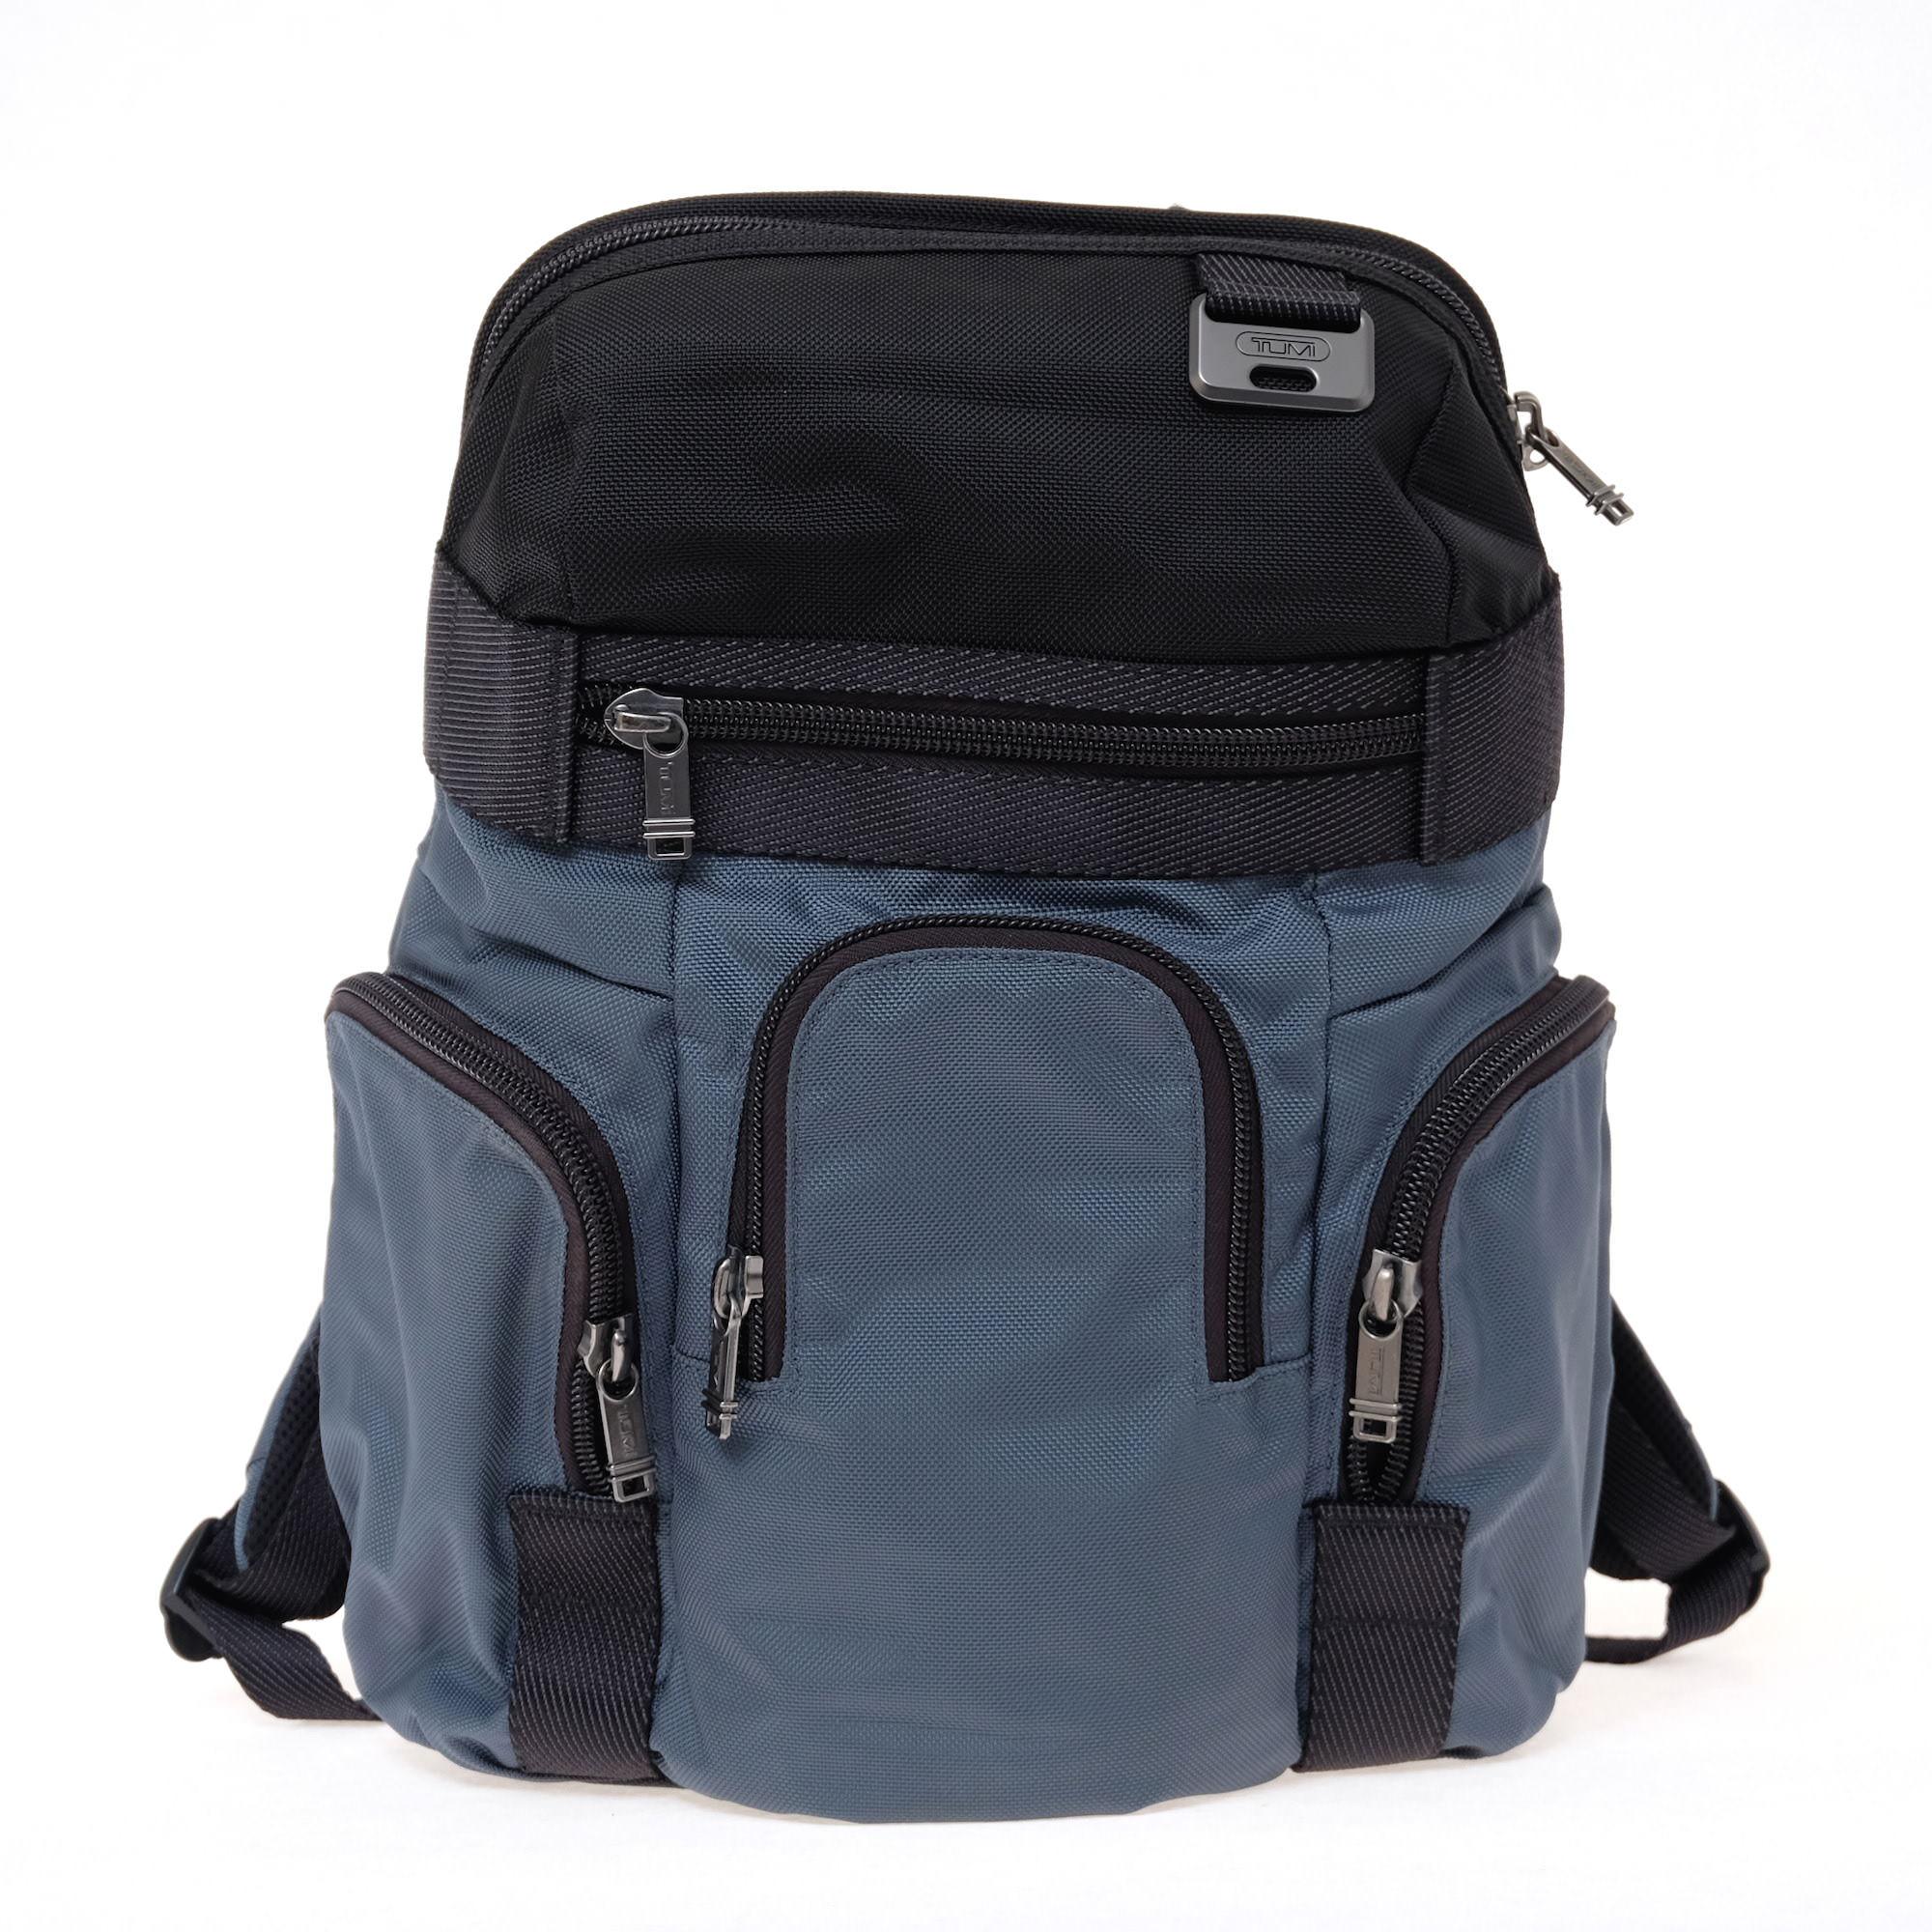 1725aba651fa トゥミ / TUMI リュック メンズ グレー 灰色 69383SBDO Wallingford Triple Pocket Backpack  トリプルポケット バックパック - ブランディング